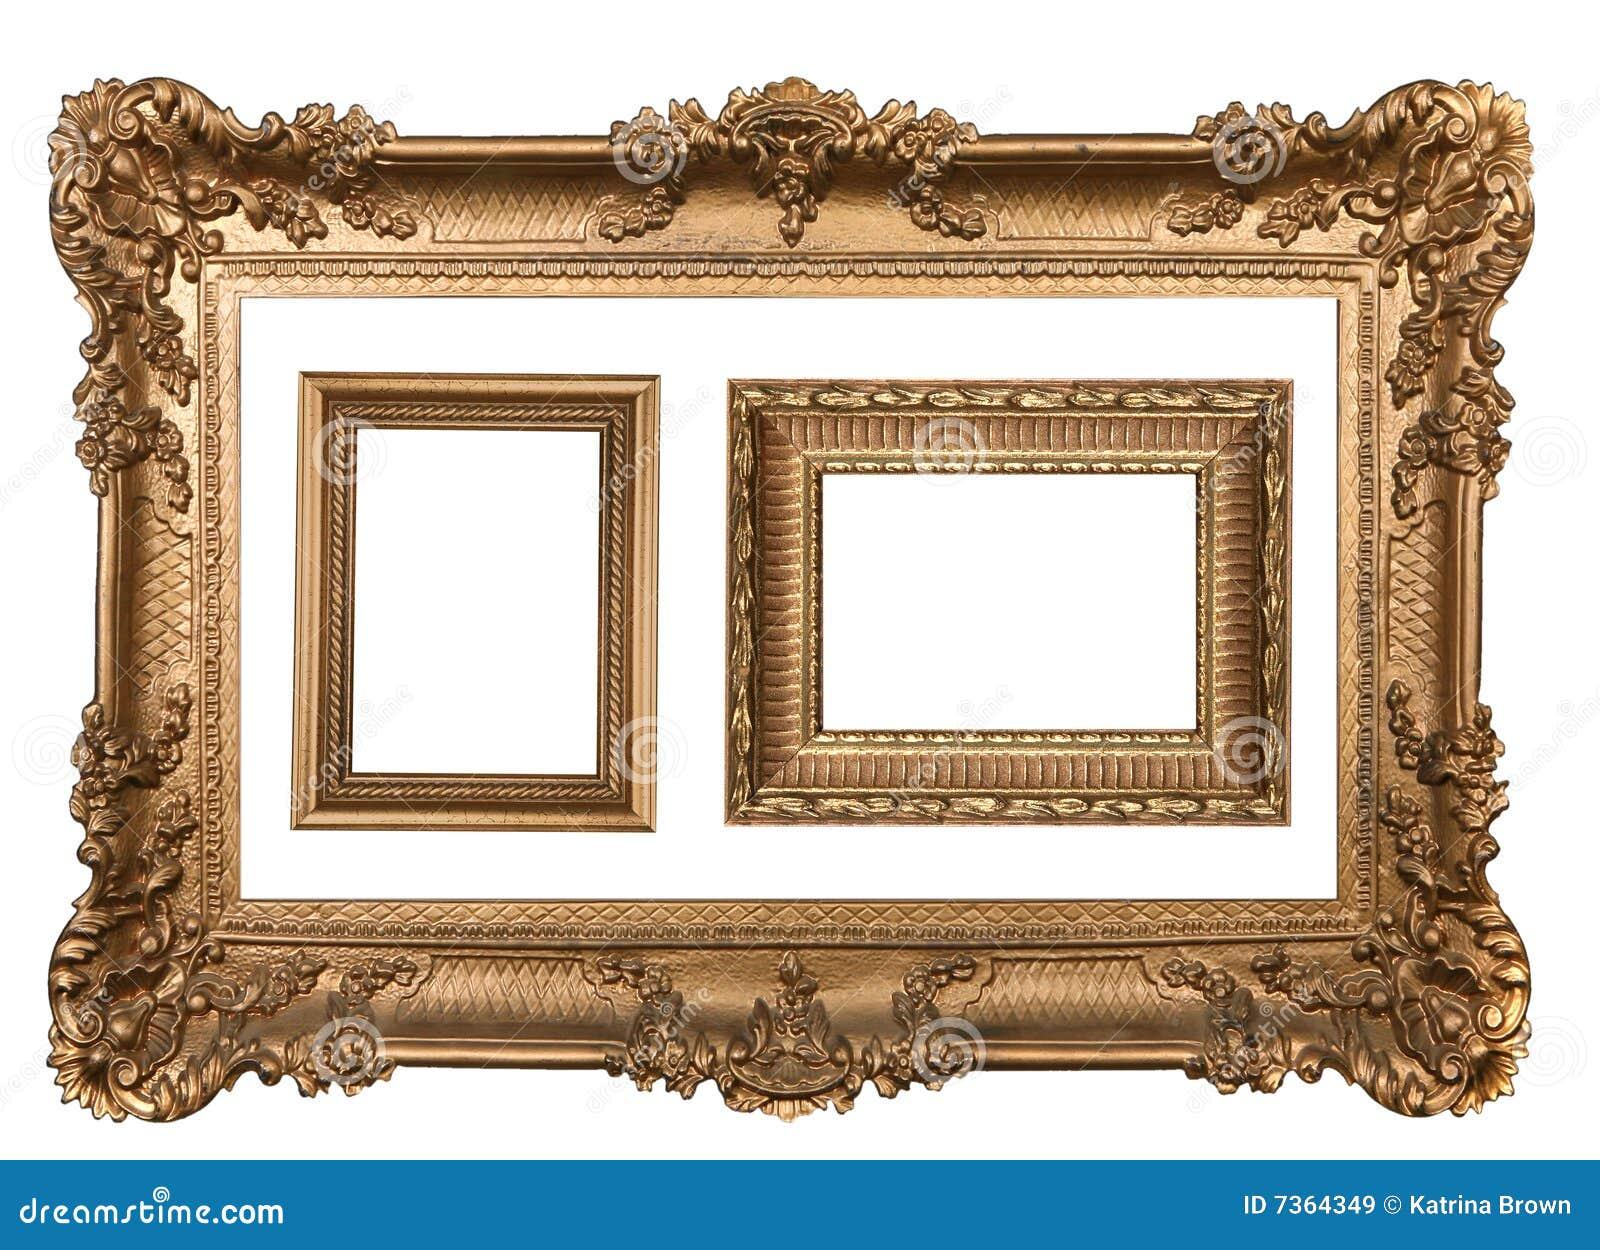 3 Dekoratives Goldleere Wand-Bilderrahmen Stockbild - Bild von innen ...